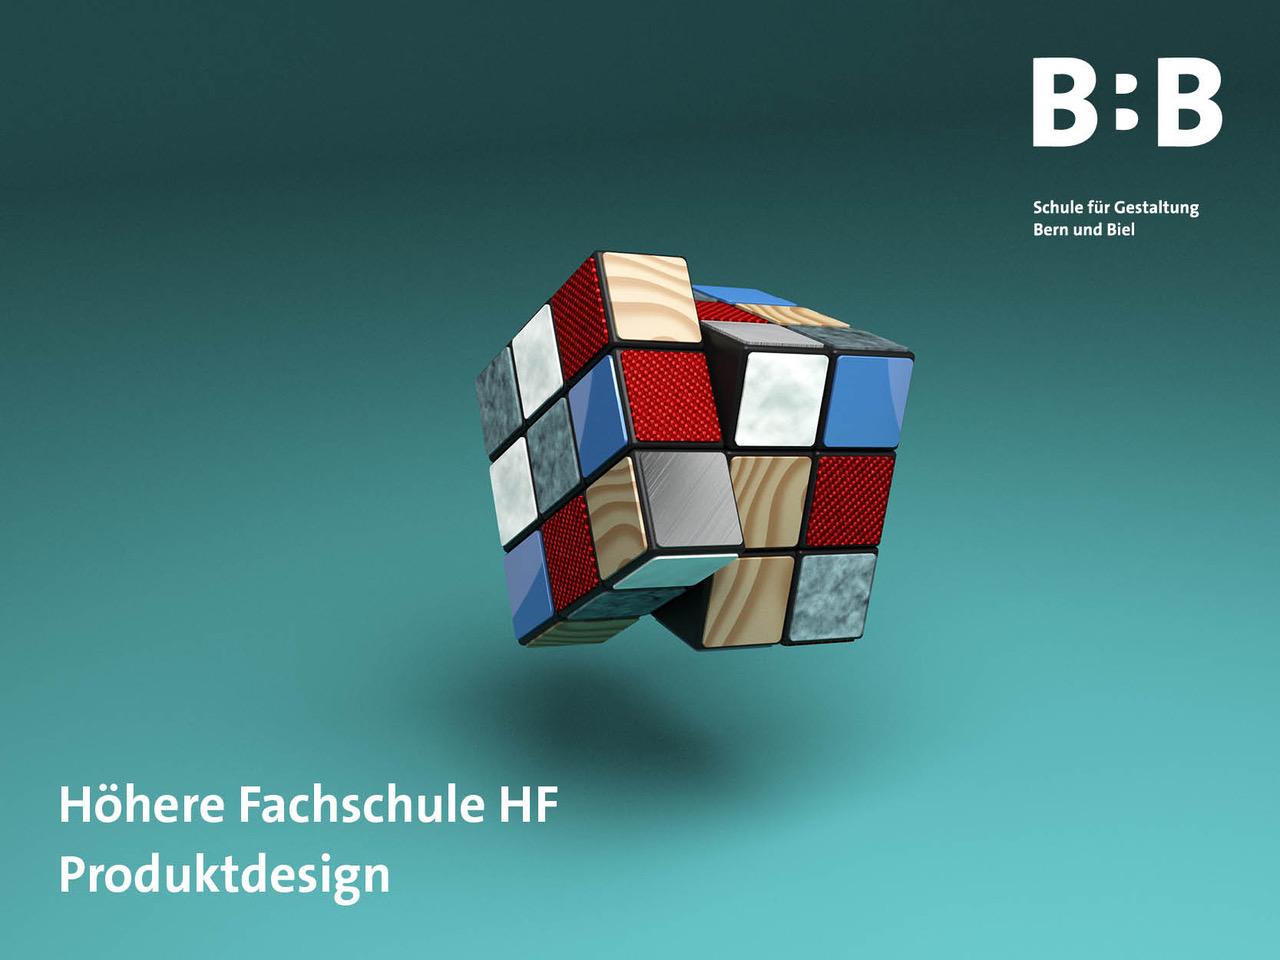 Weiterbildungs Angebot Hf F R Gestaltung Produktdesign De